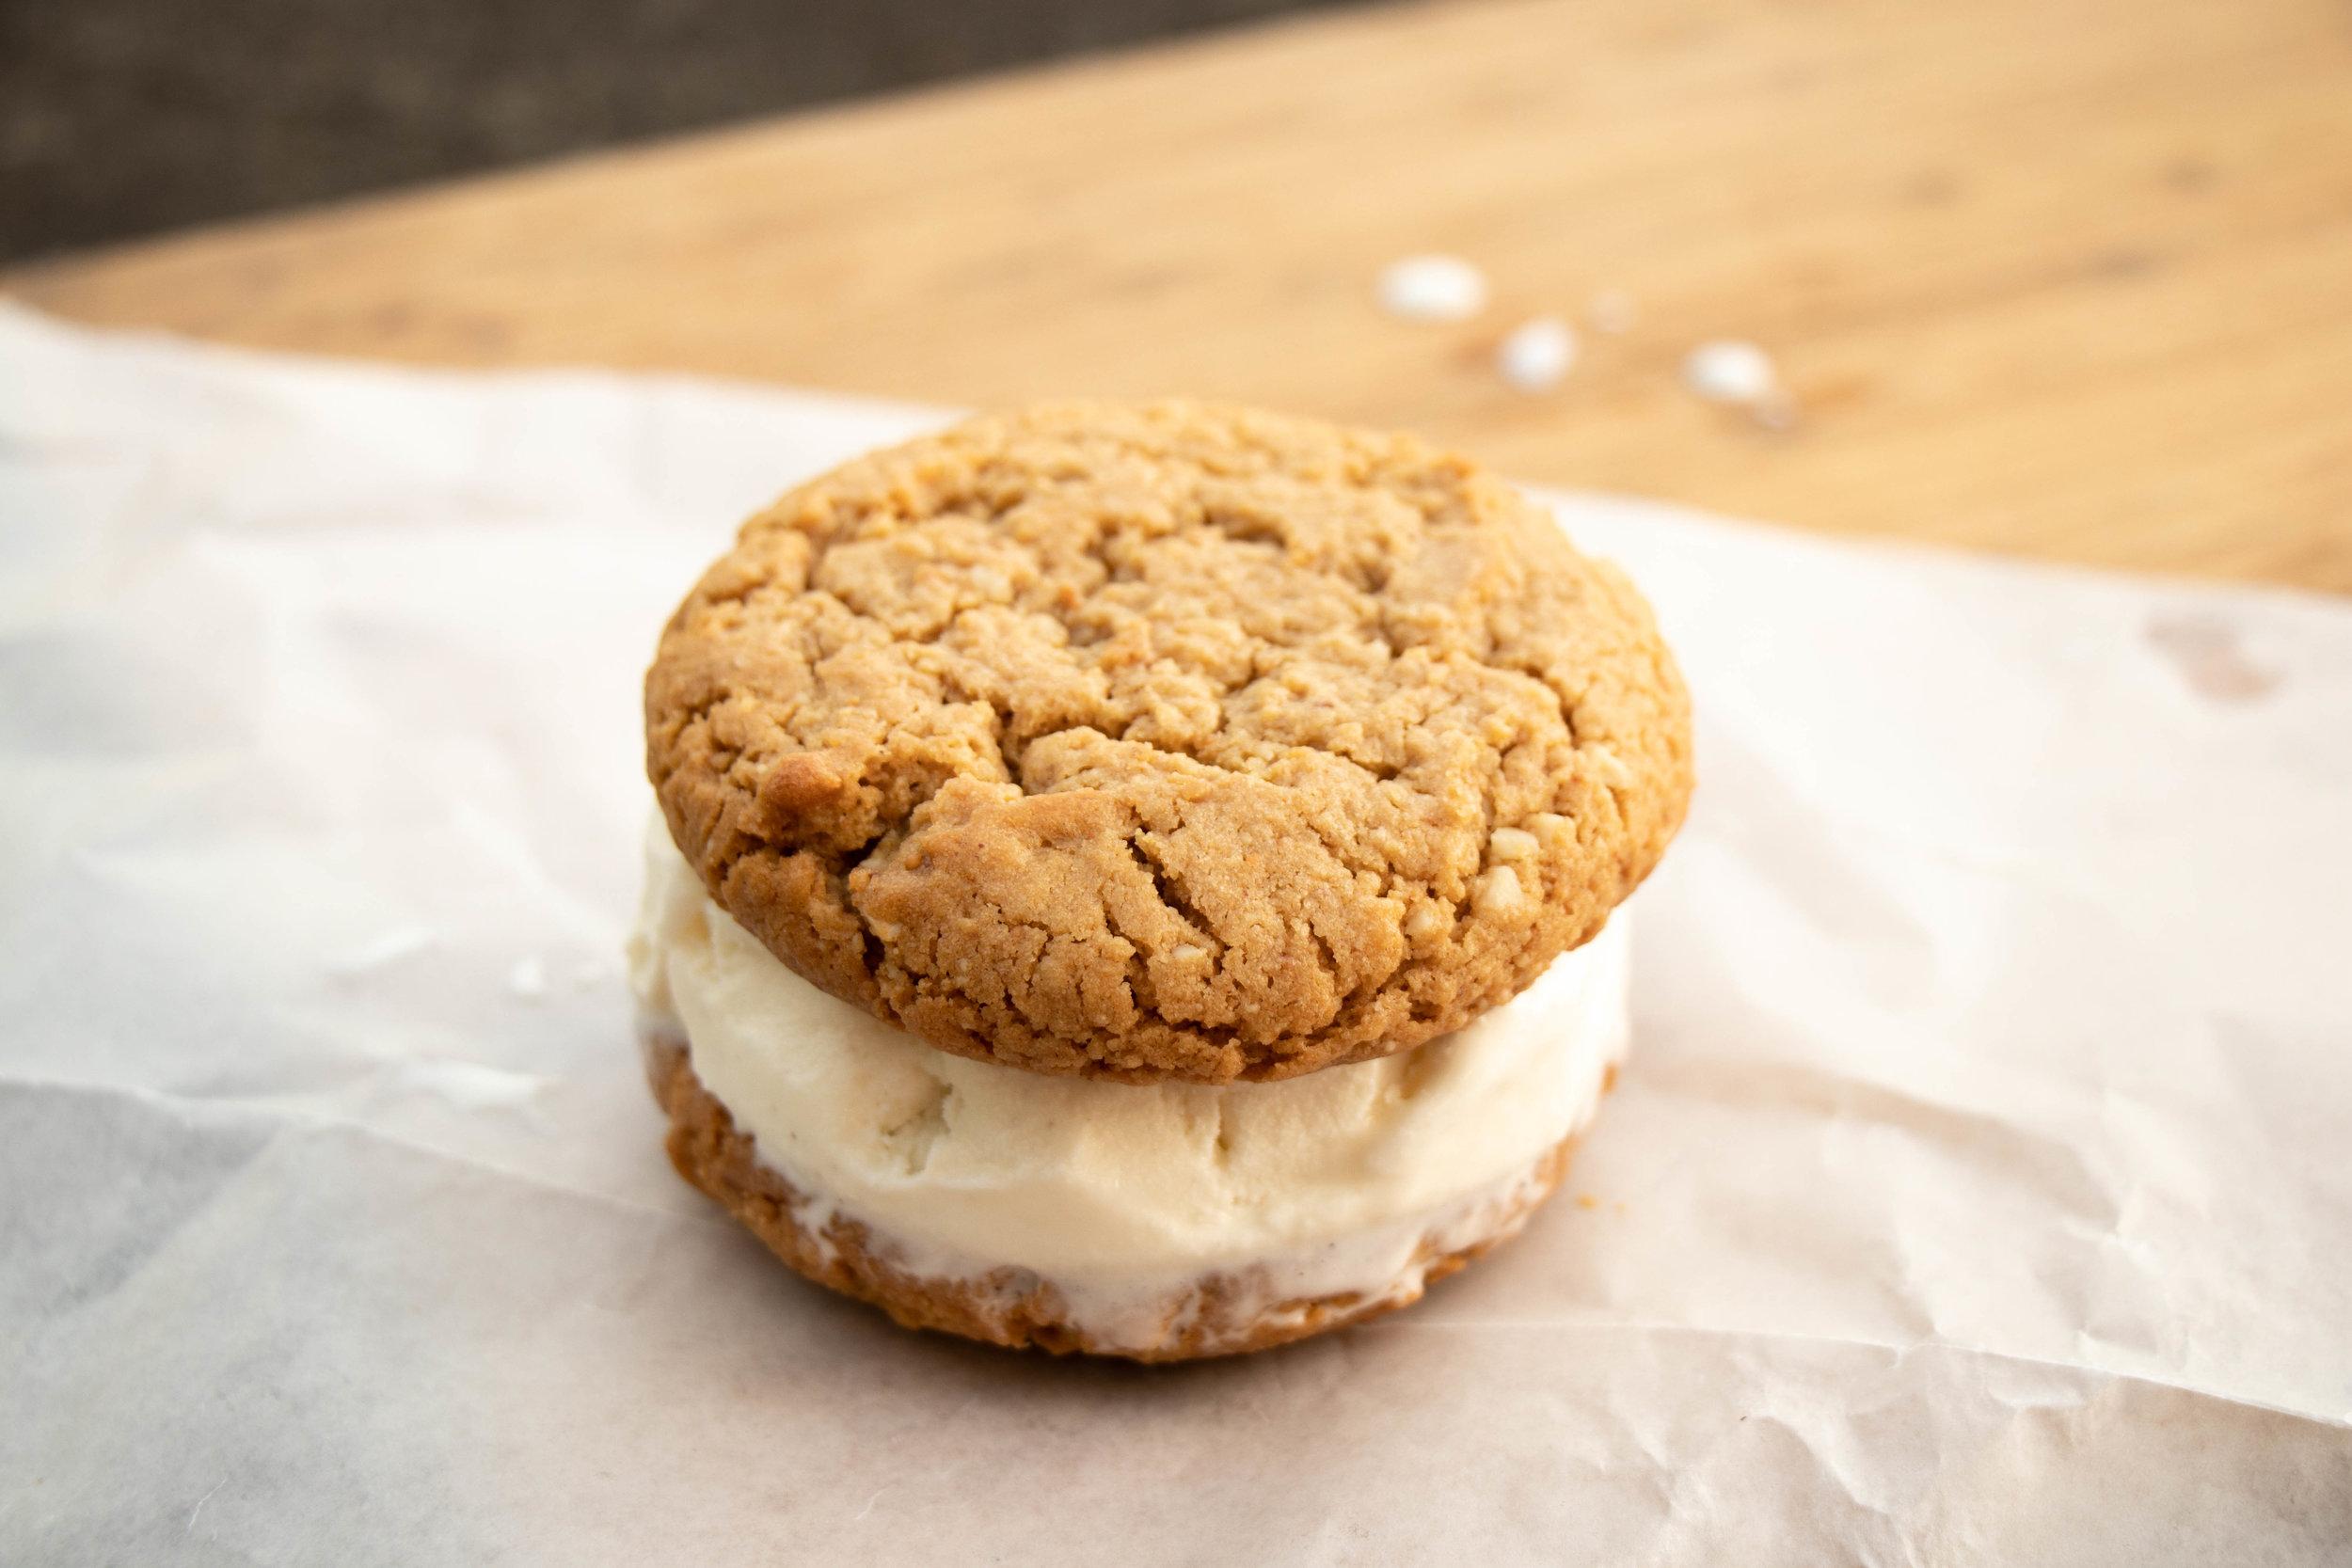 Peanut Butter Cookie Ice Cream Sandwich